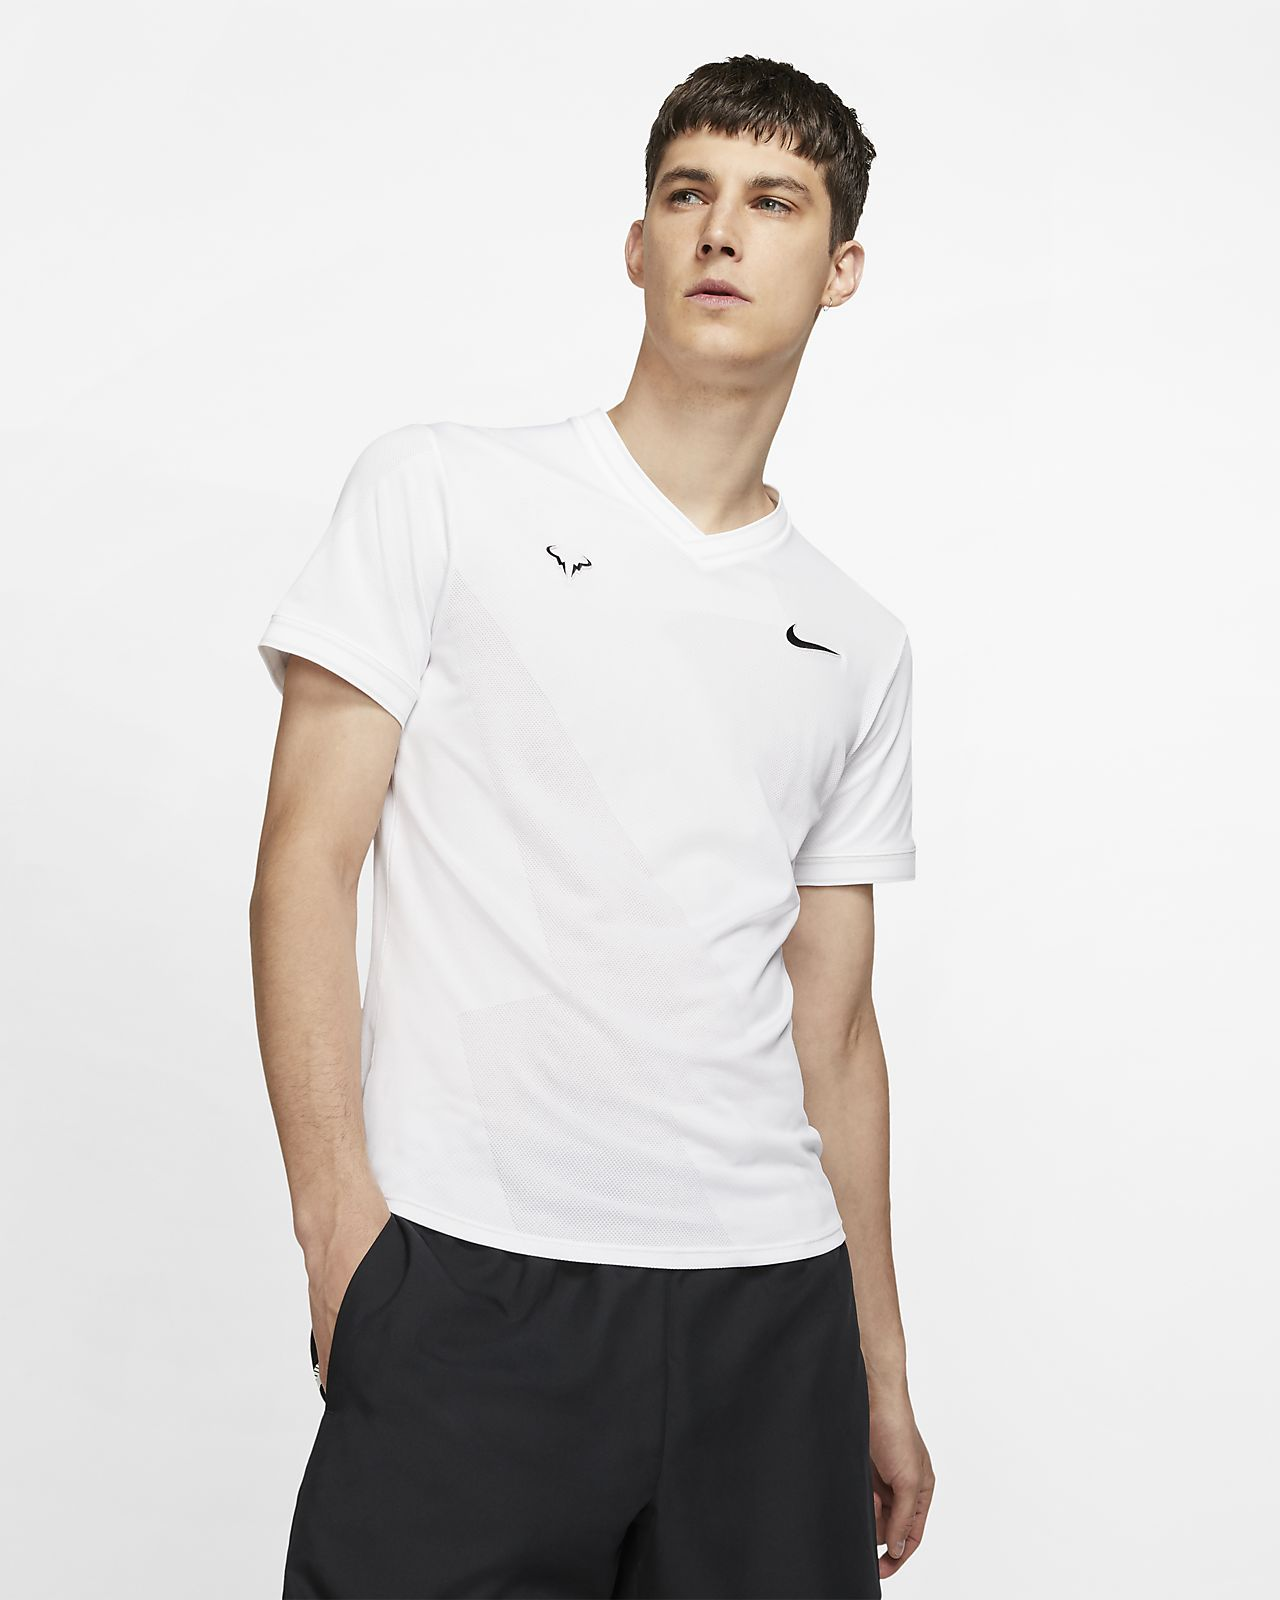 Męska koszulka z krótkim rękawem do tenisa NikeCourt AeroReact Rafa